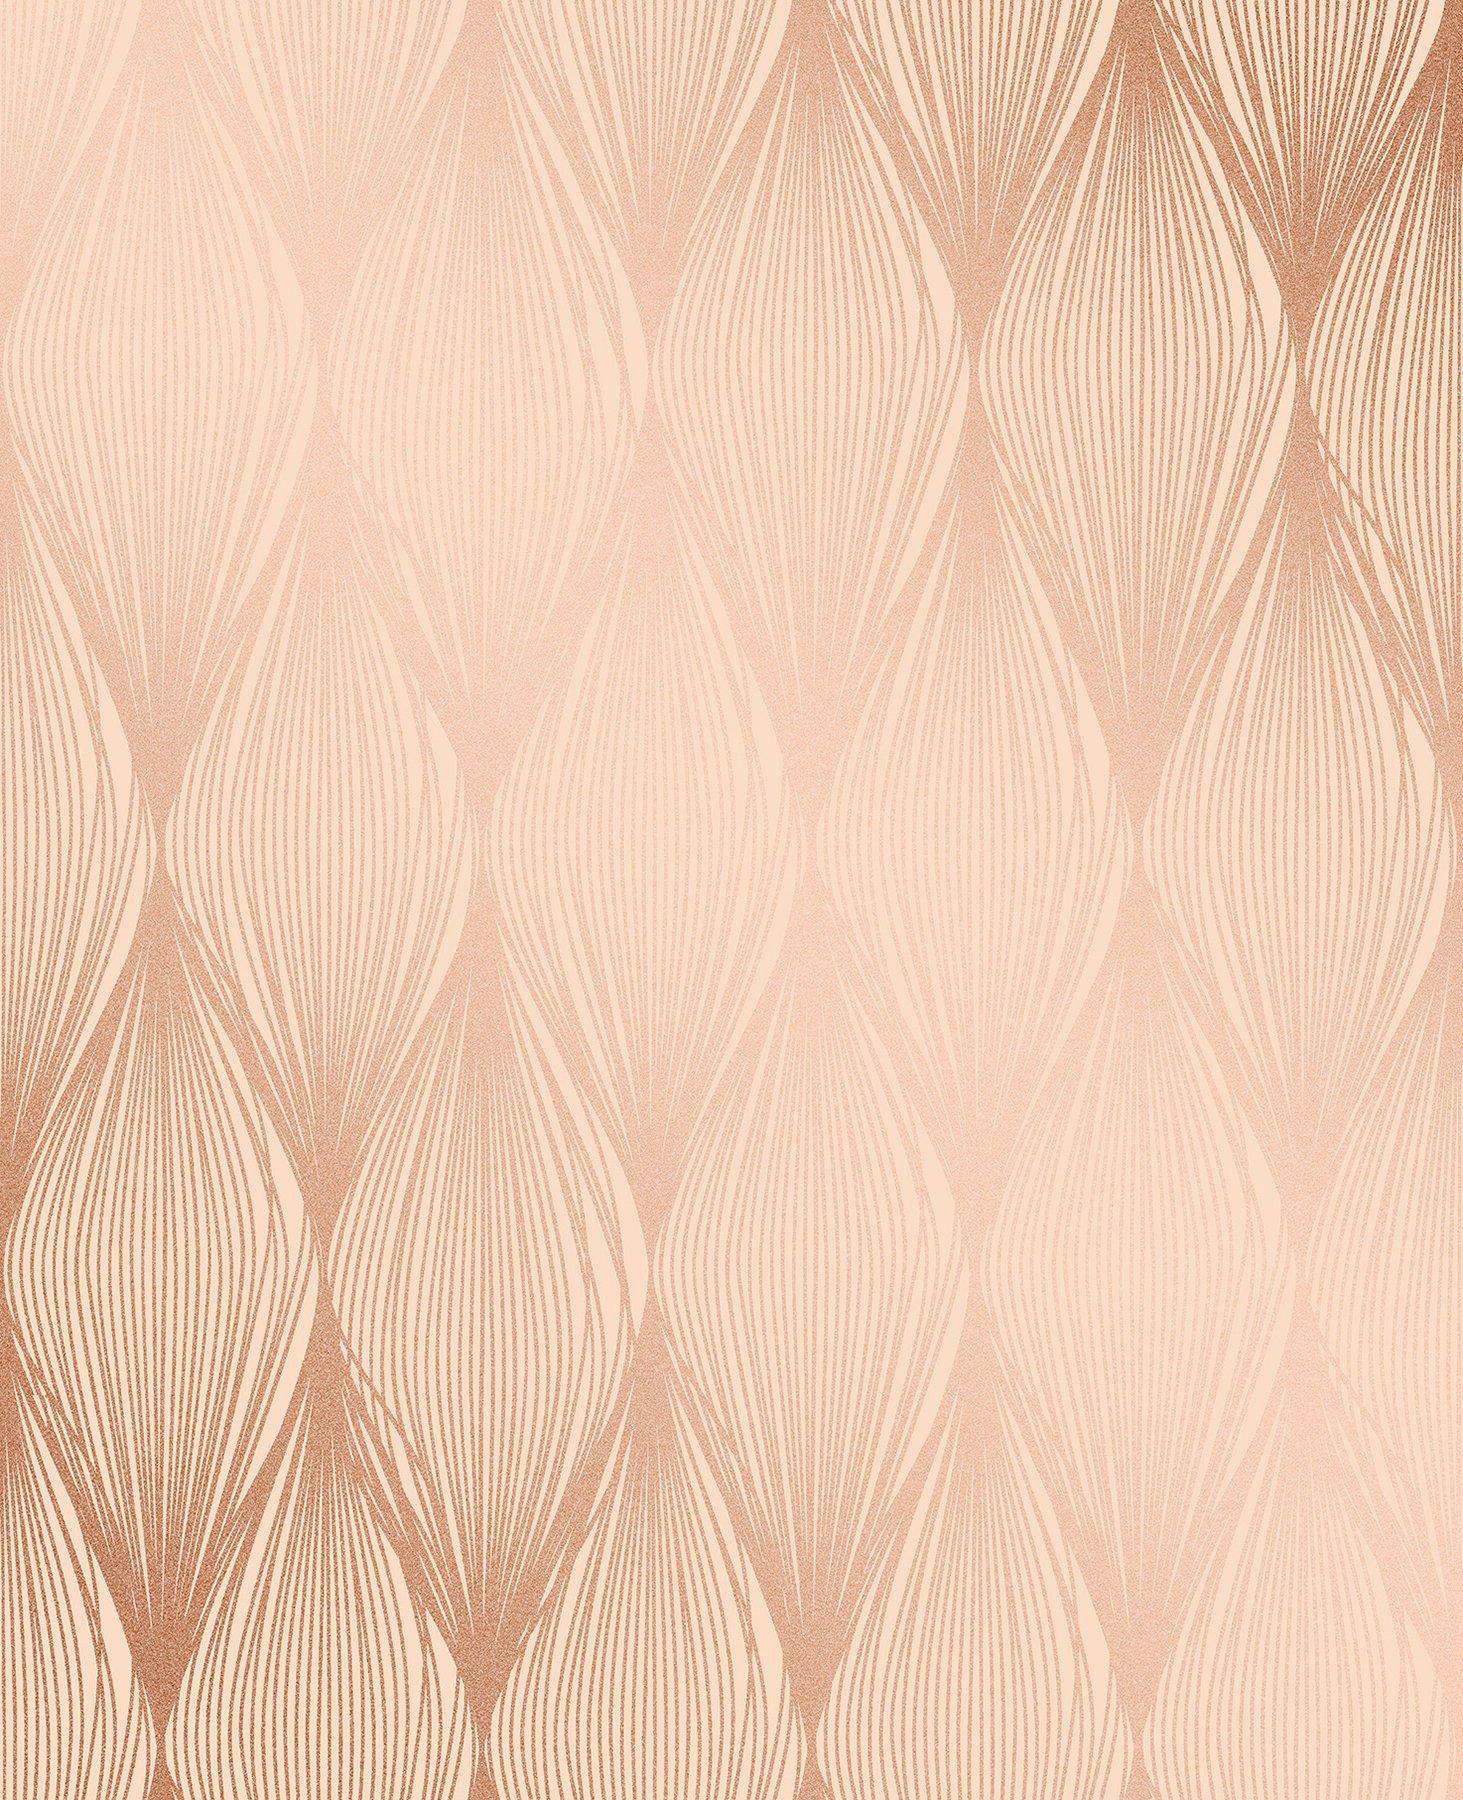 Decorline 2735-23326 Gleam Bronze Linear Ogee Wallpaper Gleam Linear Ogee Wallpaper